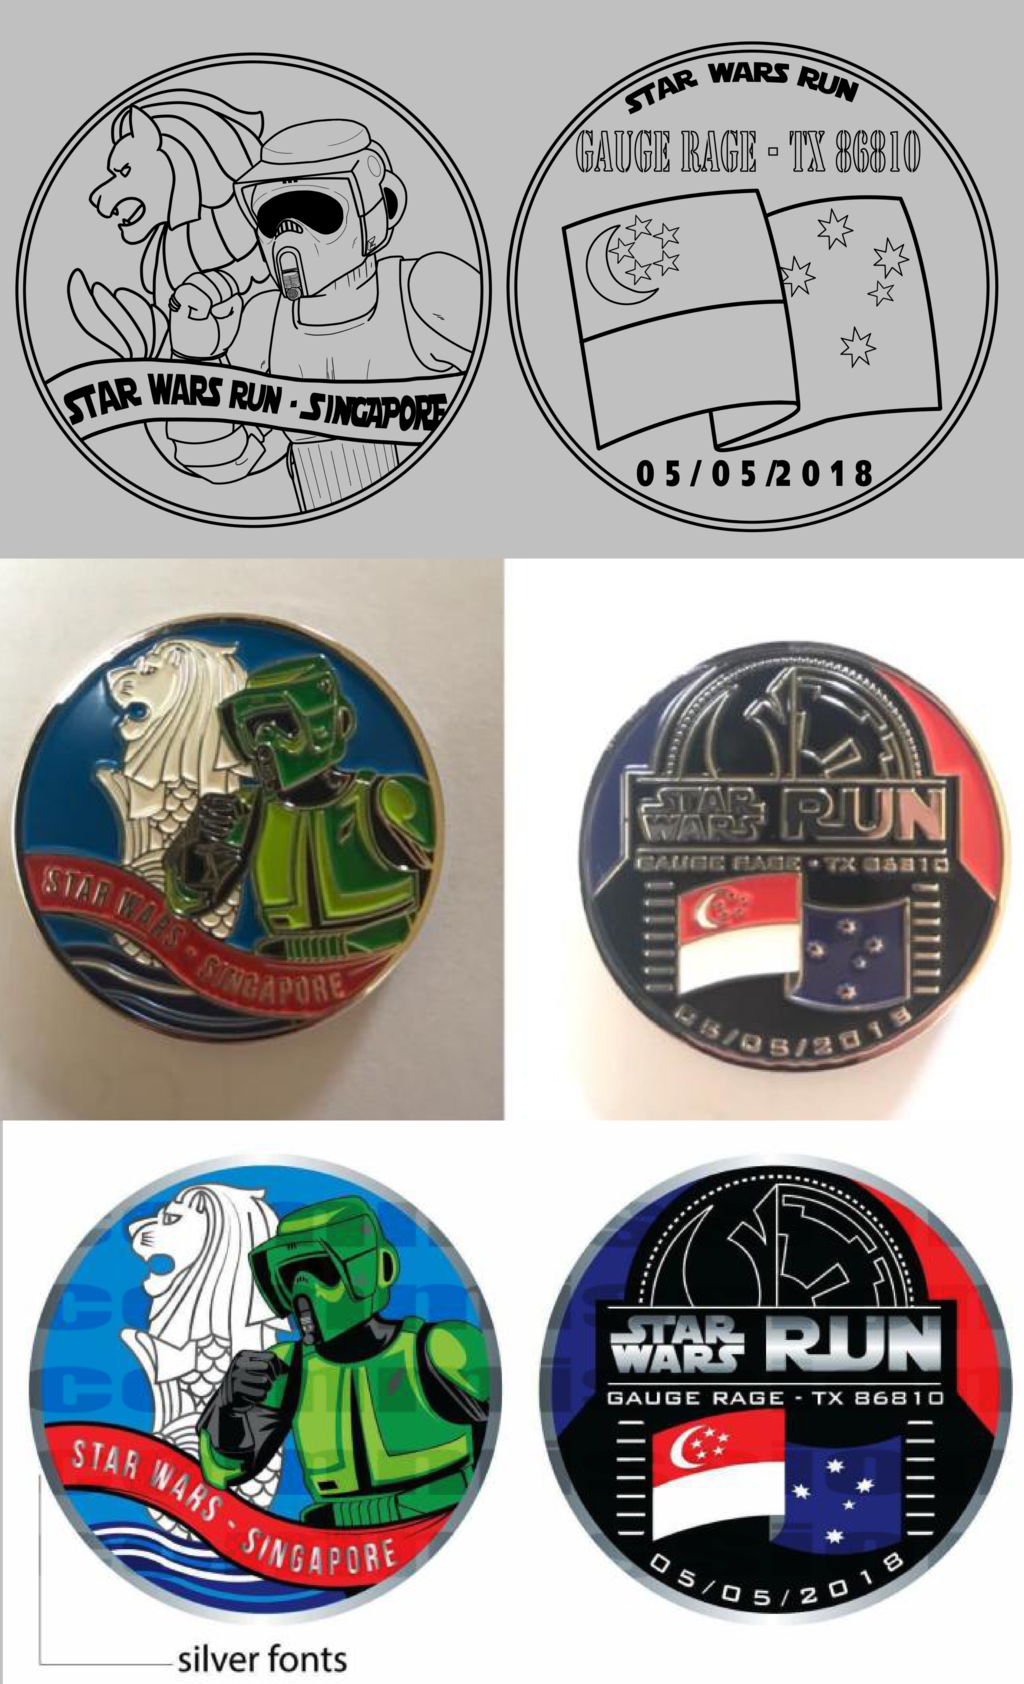 Gauge Rage - Star Wars Run Singapore Coin